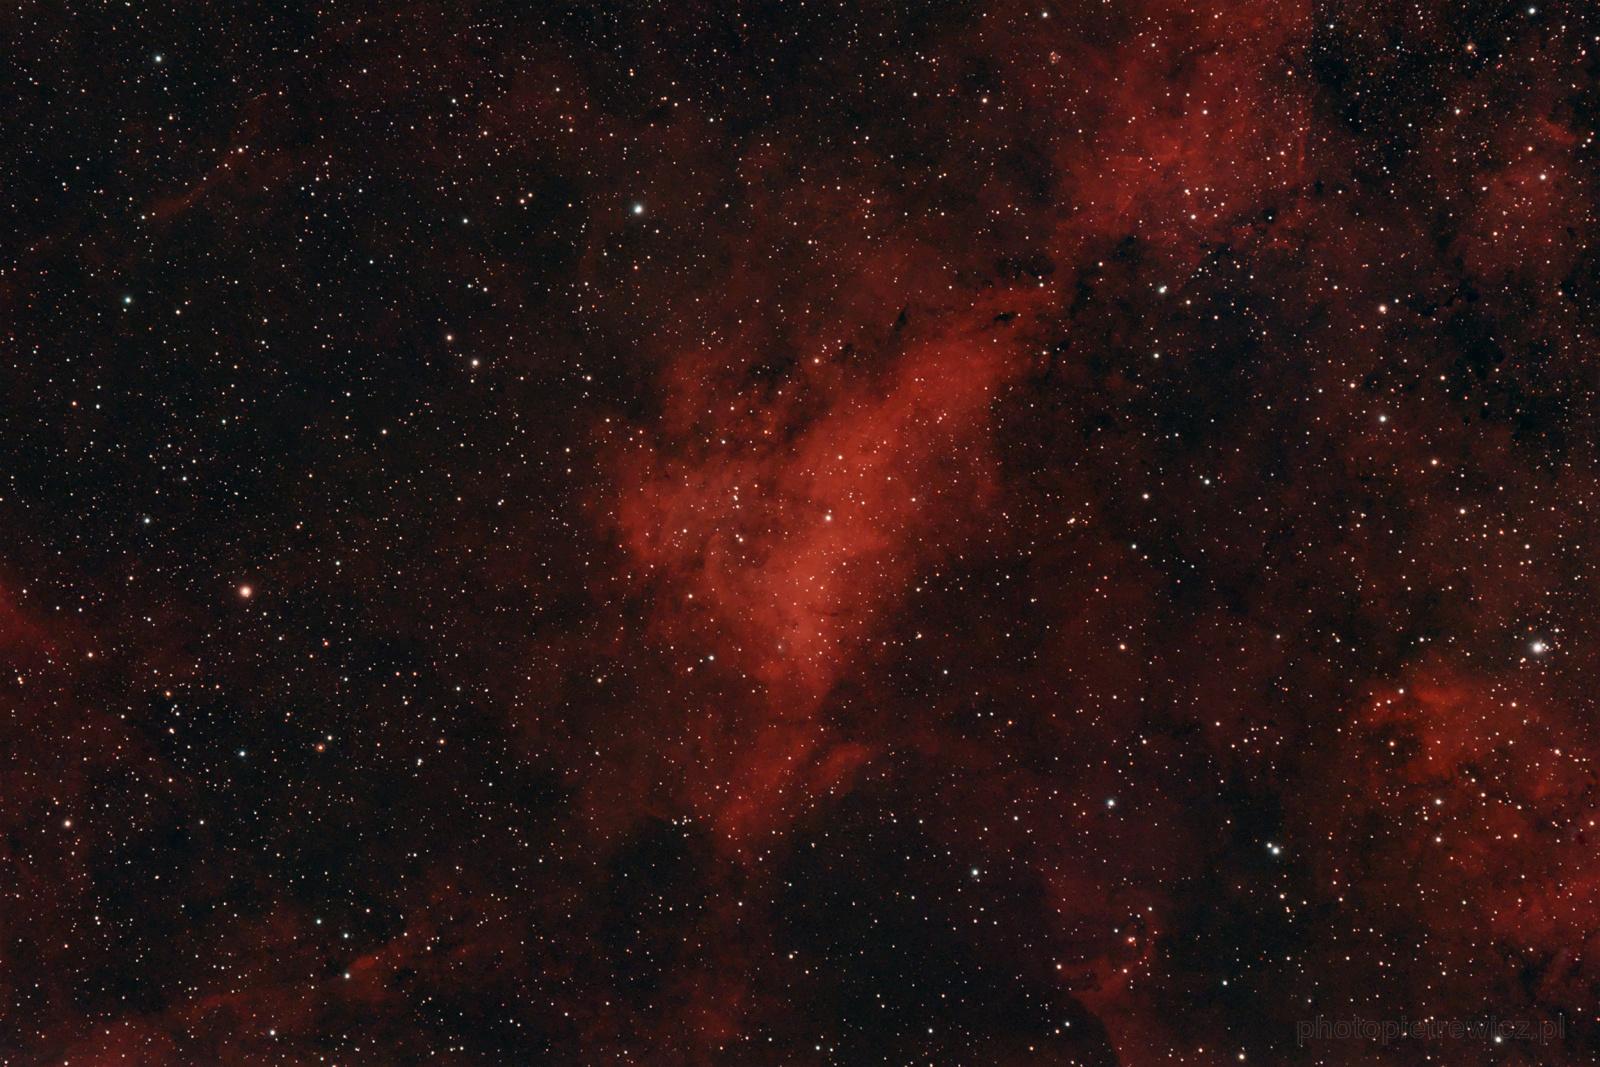 IC1318A_fb2.thumb.jpg.165fd222354857b9d7cbc589e6b3c539.jpg